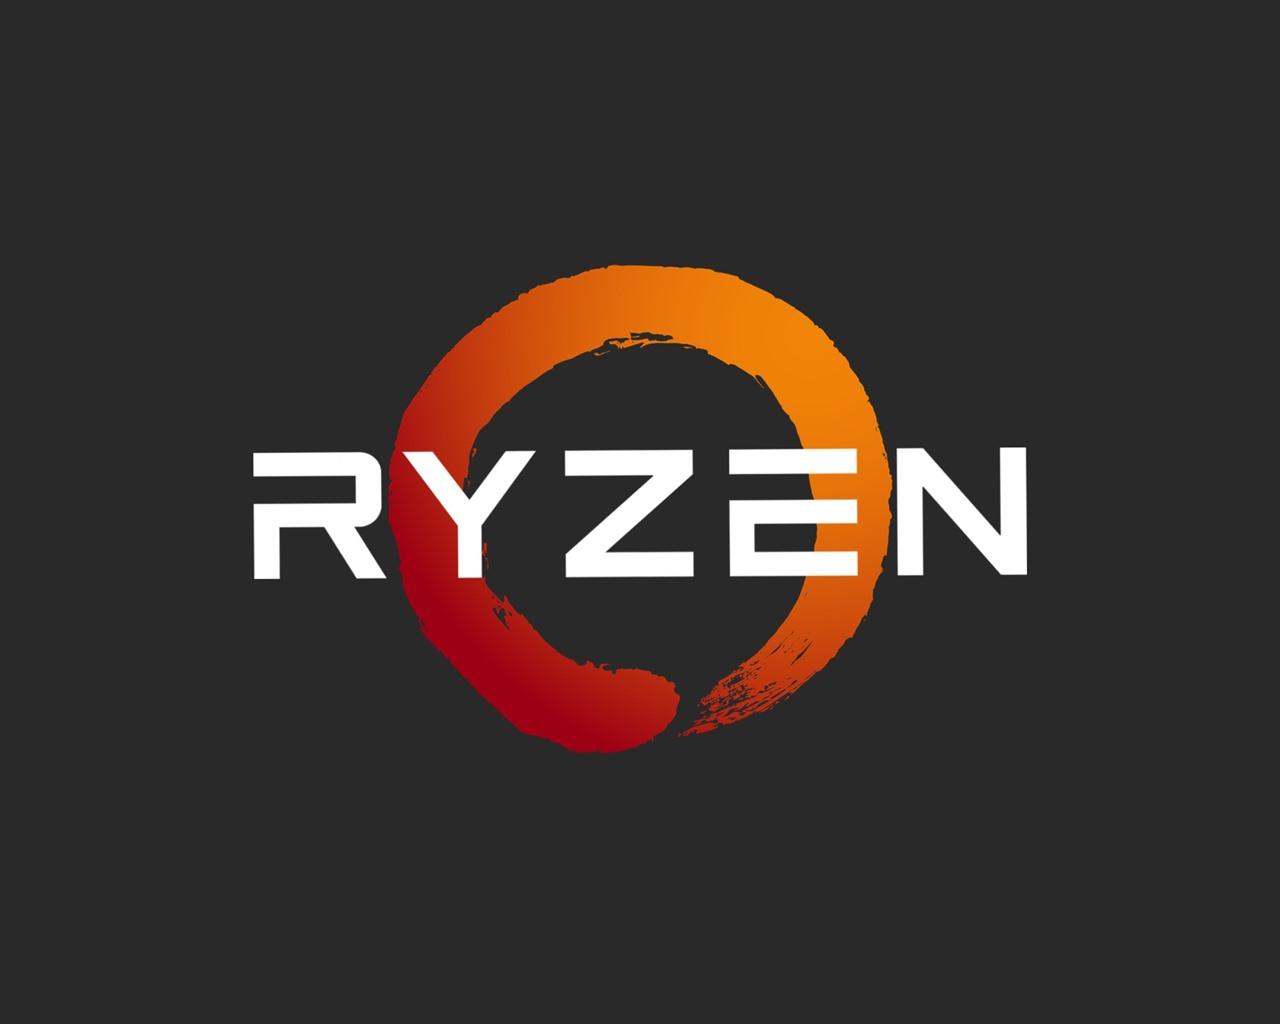 Wallpaper Amd Ryzen Processor Logo 2560x1440 Qhd Picture Image